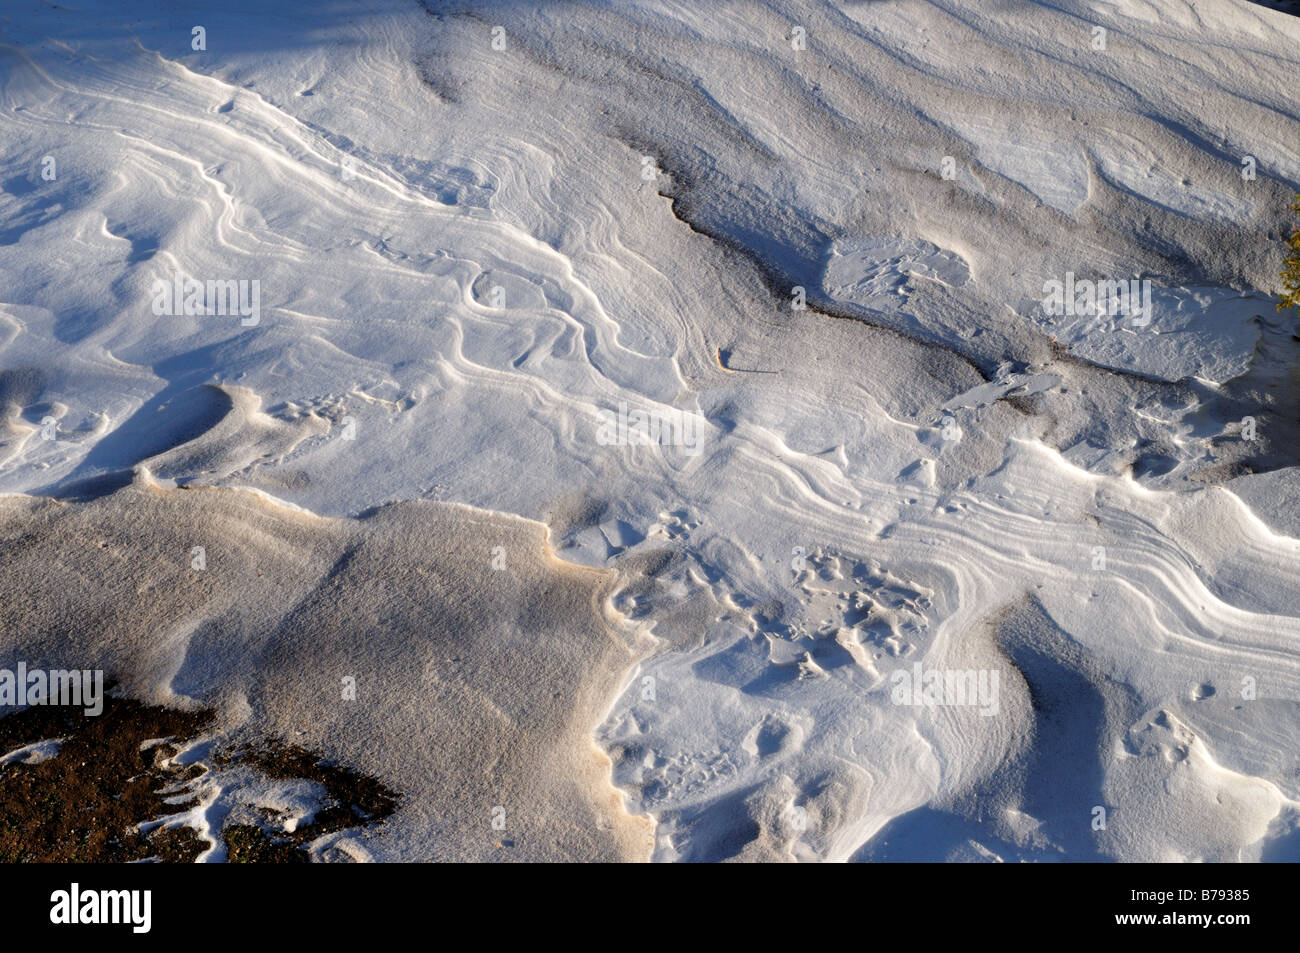 Modelli di strati di neve. Big Sky, Montana, USA. Immagini Stock